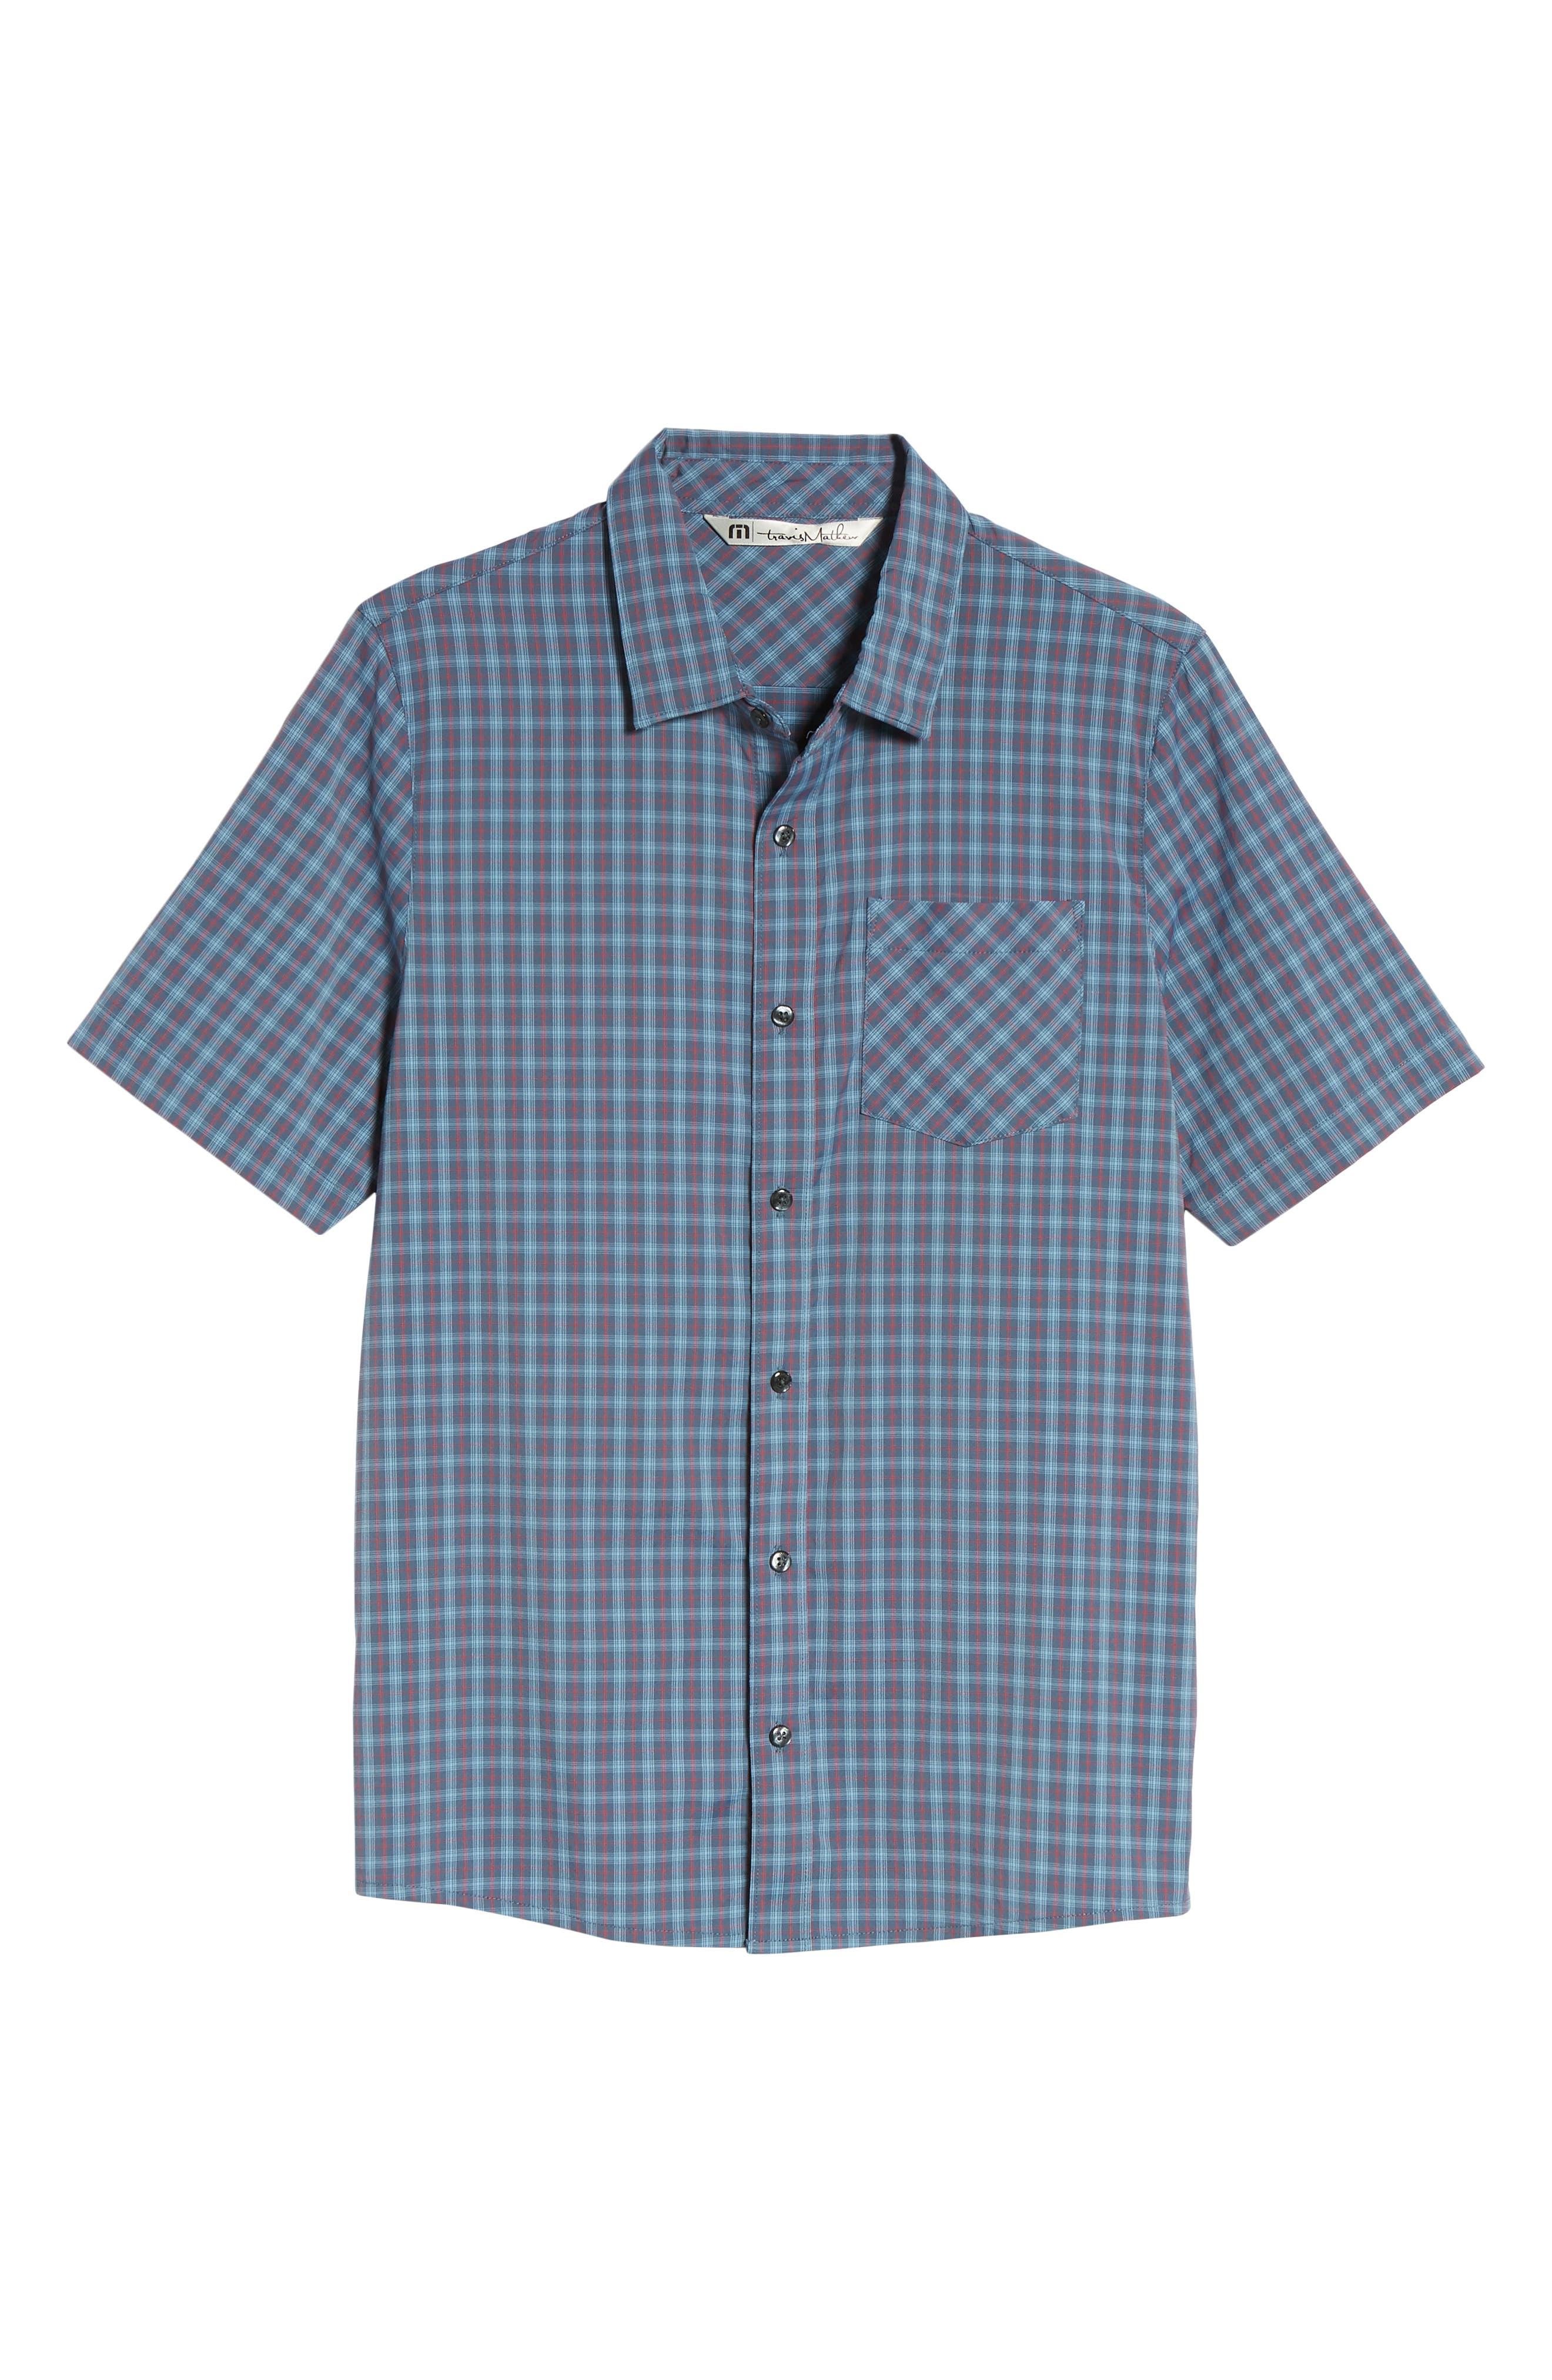 Smoke Bomb Regular Fit Short Sleeve Sport Shirt,                             Alternate thumbnail 6, color,                             400